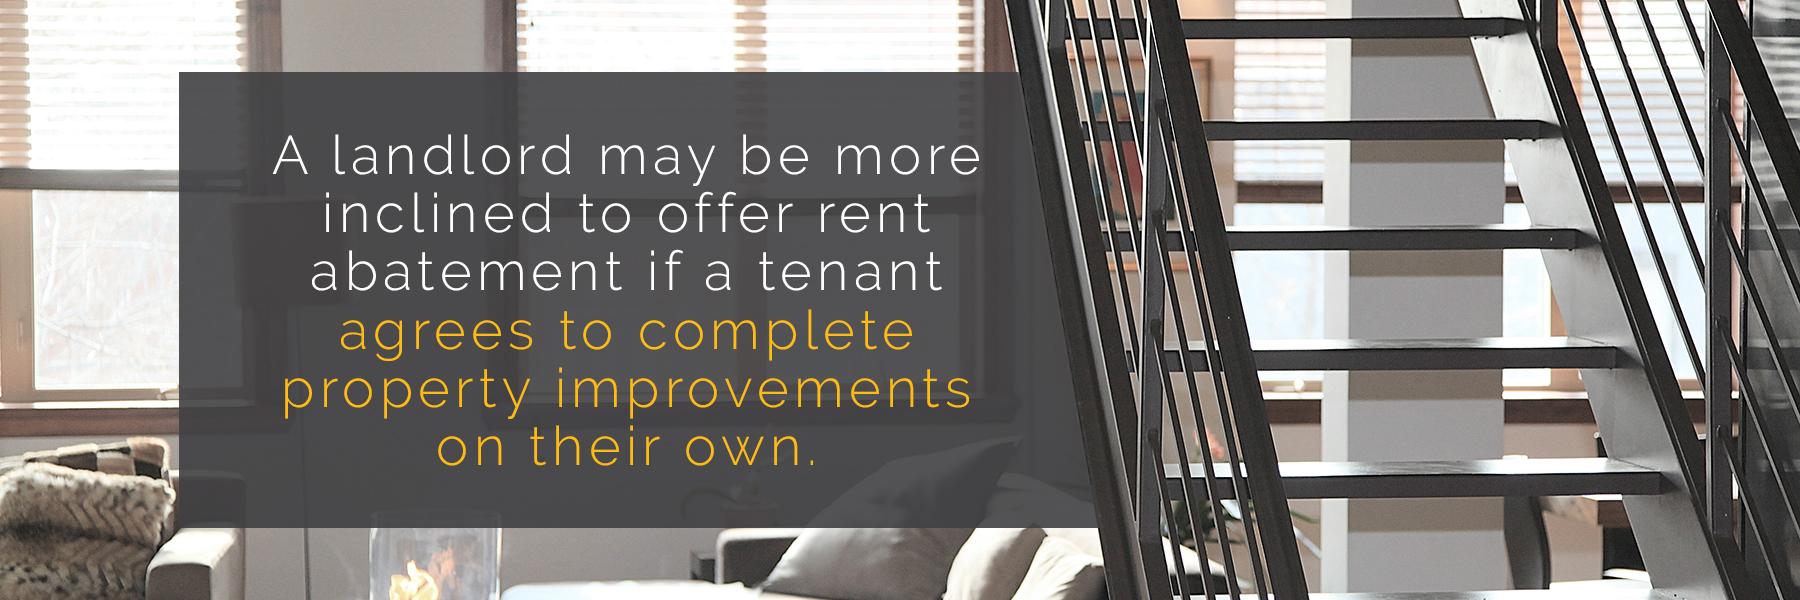 Rent Abatement for Property Improvements